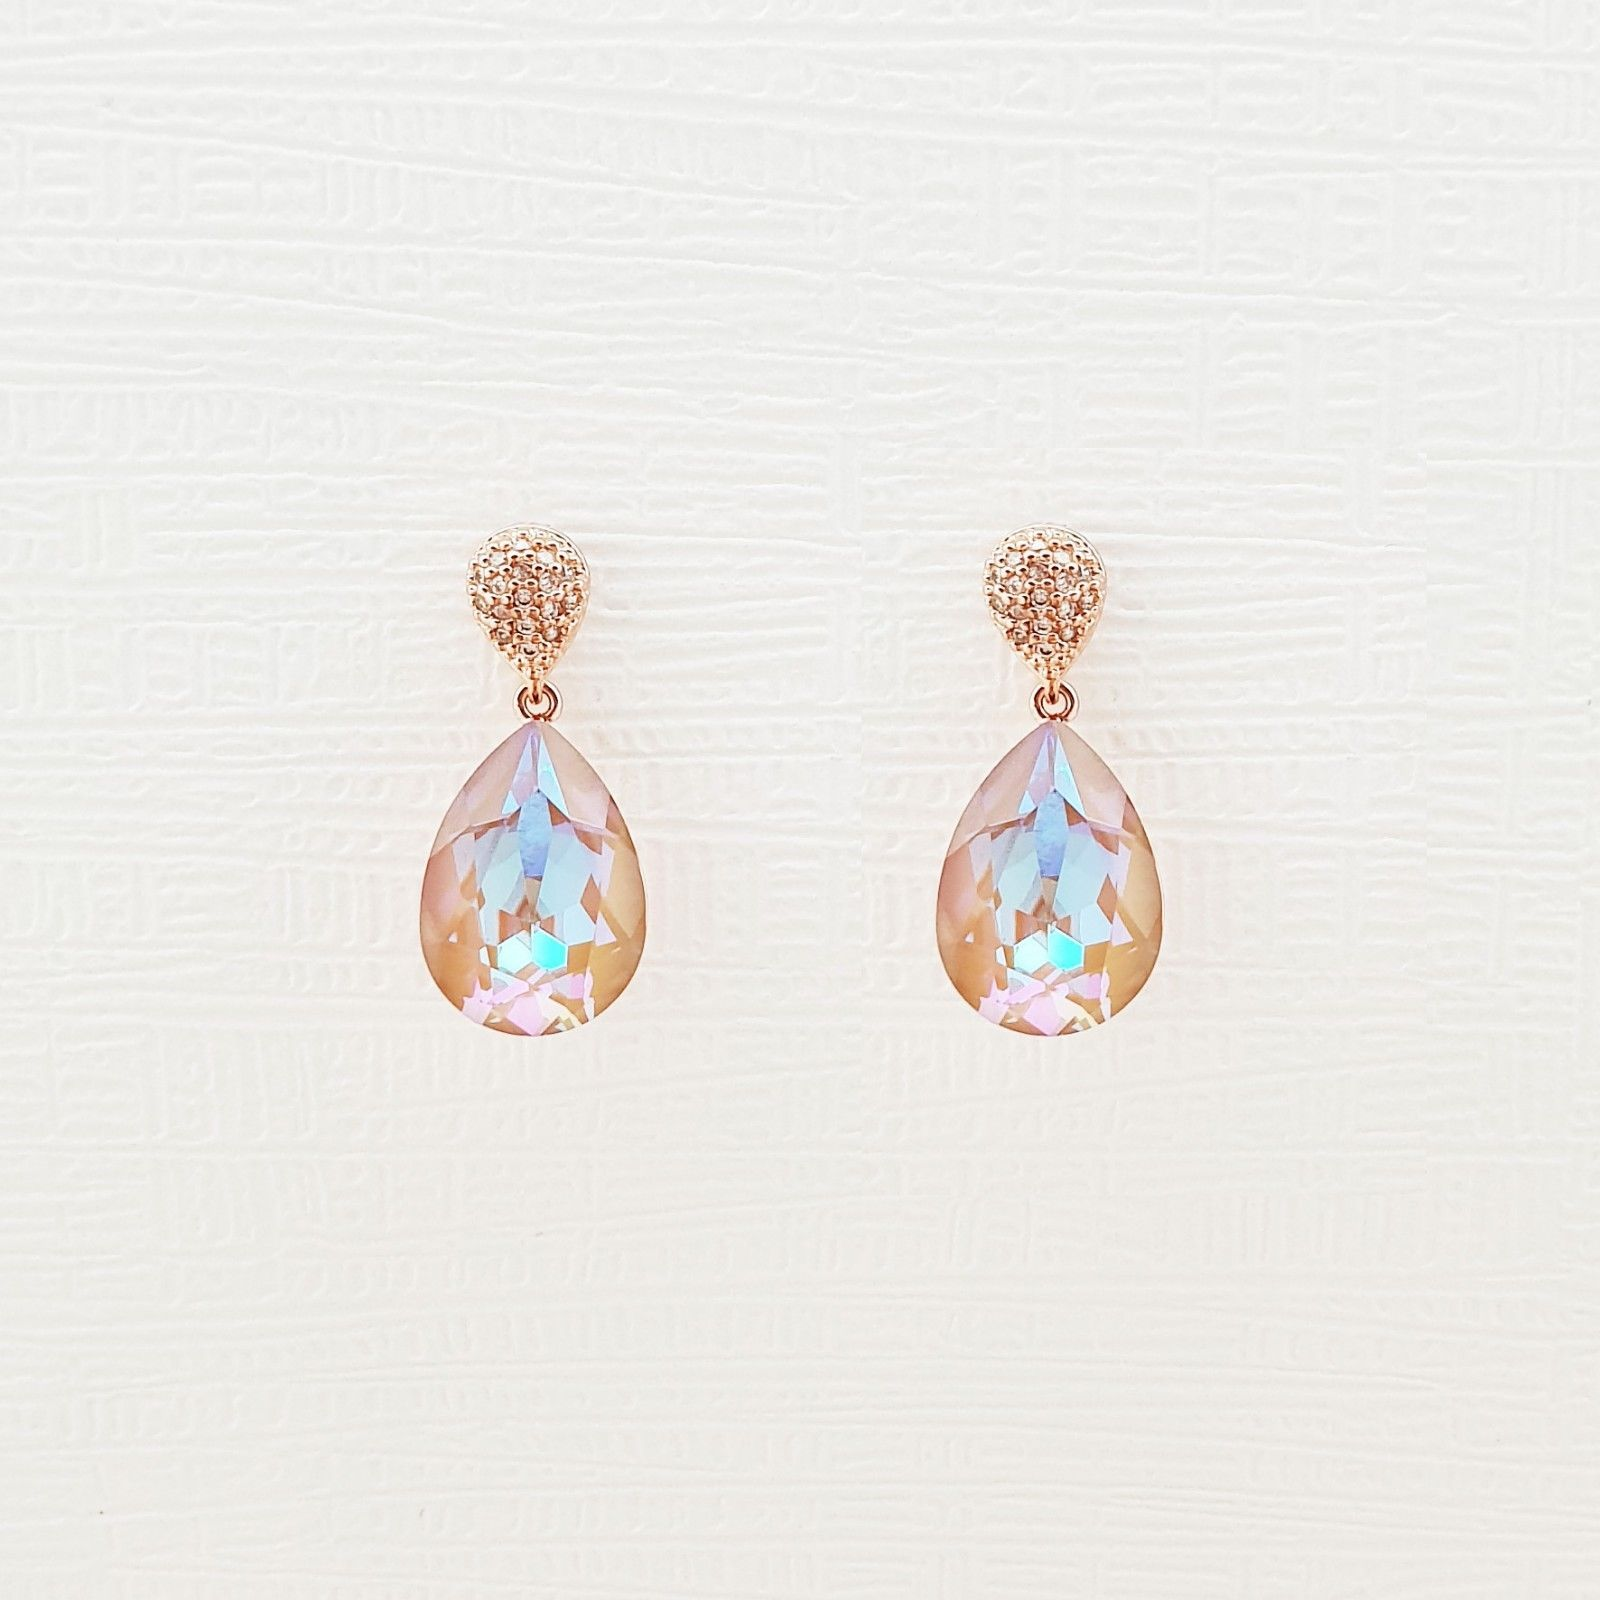 Water Drop Aurora Borealis Made With Swarovski Stone Dangle Earrings 925 Silver image 3